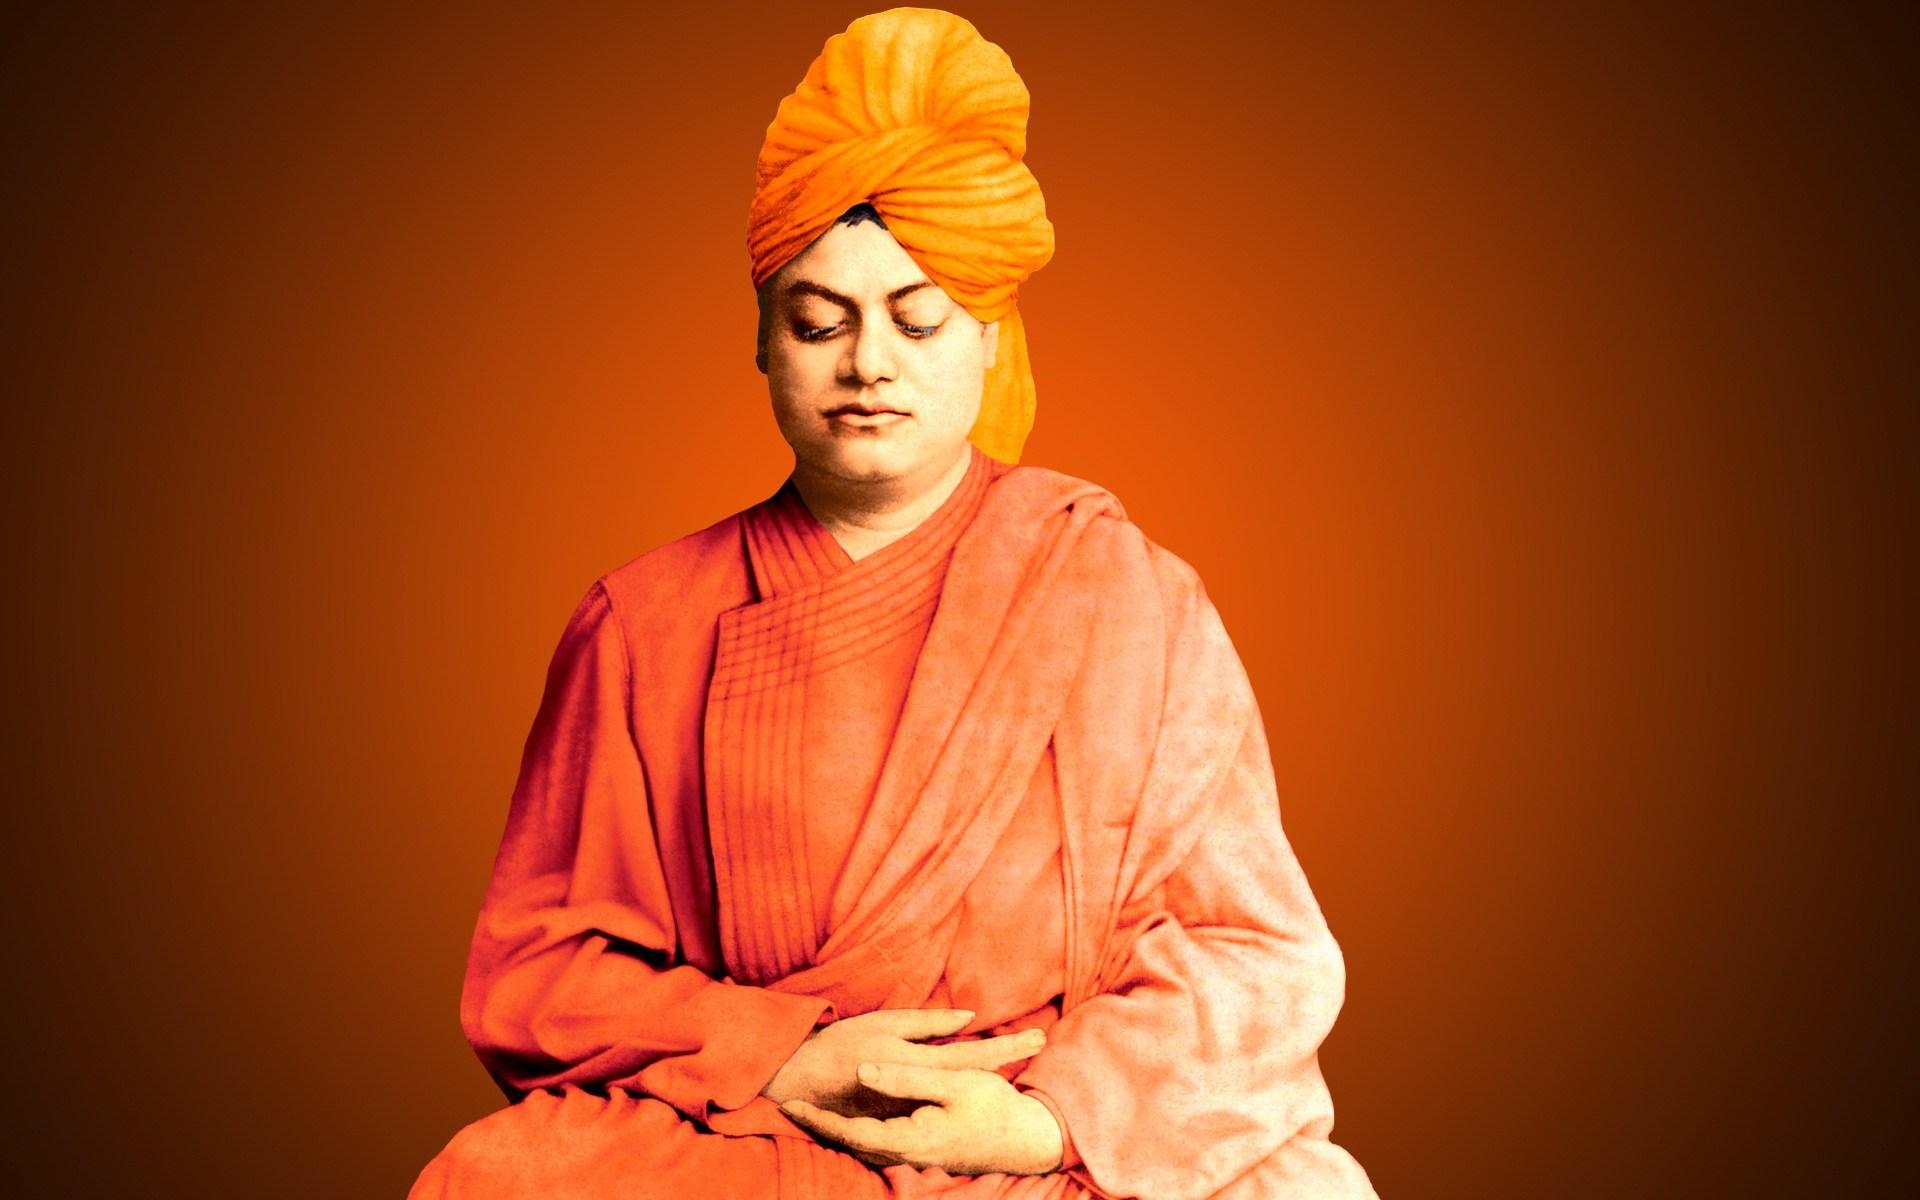 Swami Vivekananda Latest Hd Wallpapers   Hd Wallpaper Swami 1920x1200